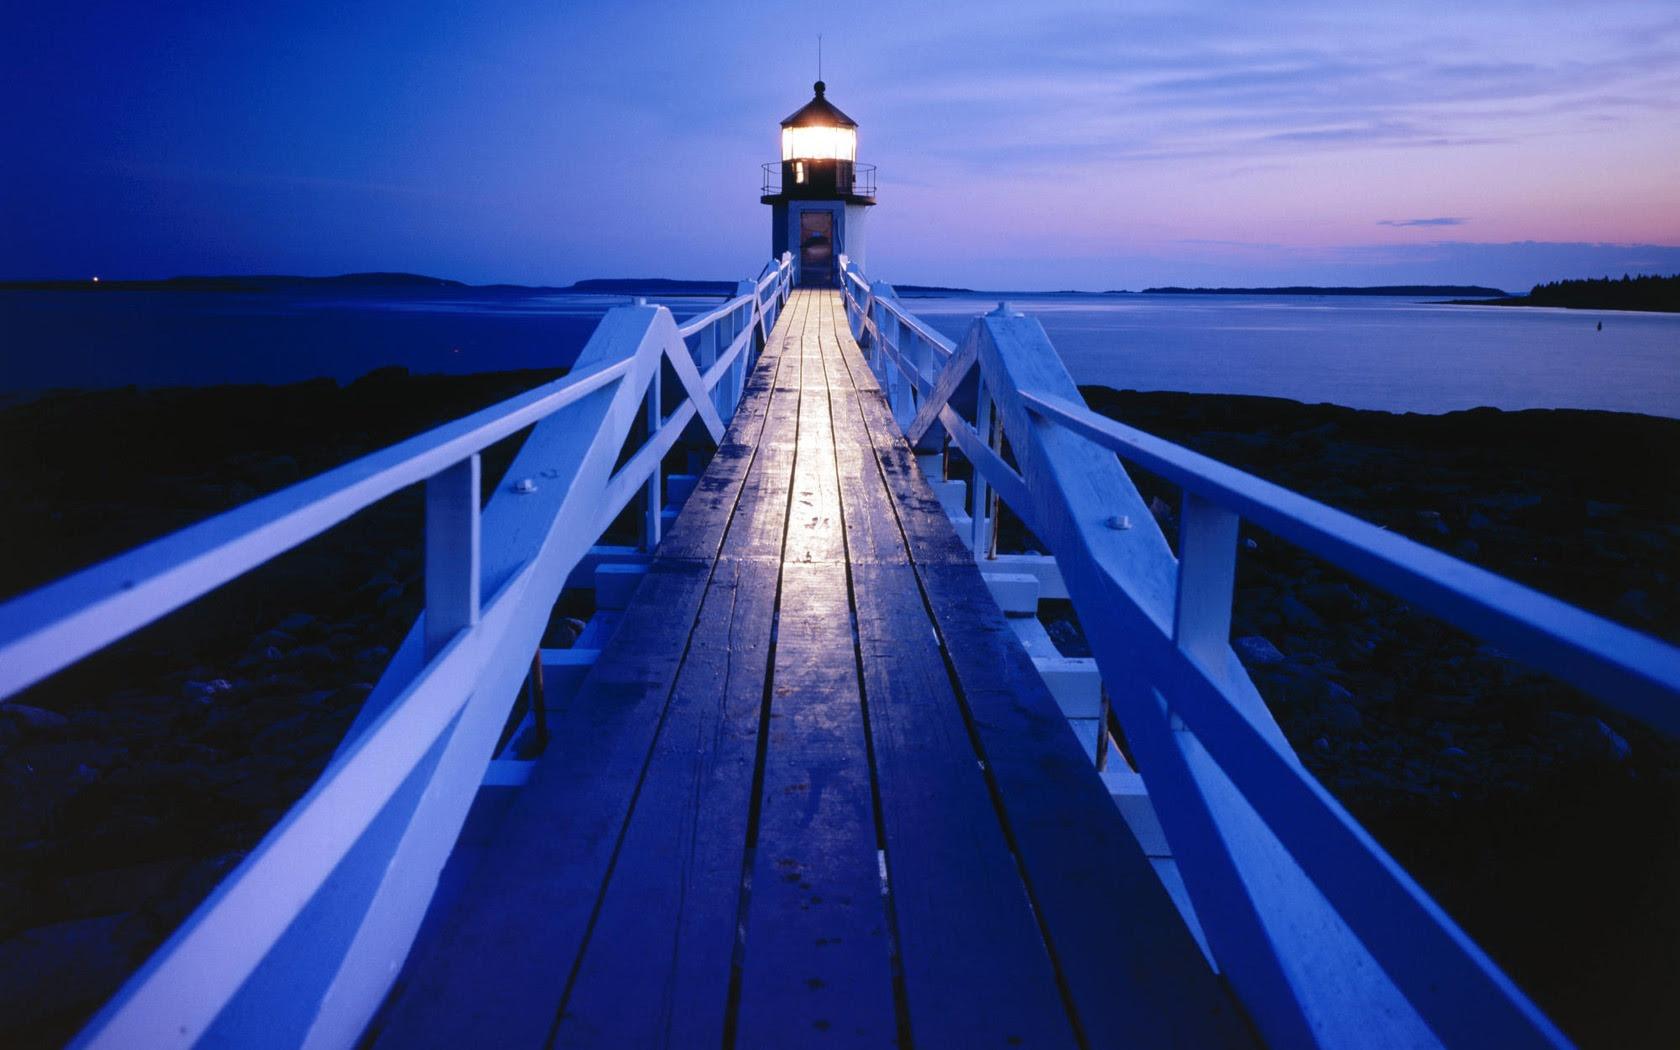 Coastal Lighthouse Hd Wallpaper 20 1680x1050 Wallpaper Download Images, Photos, Reviews